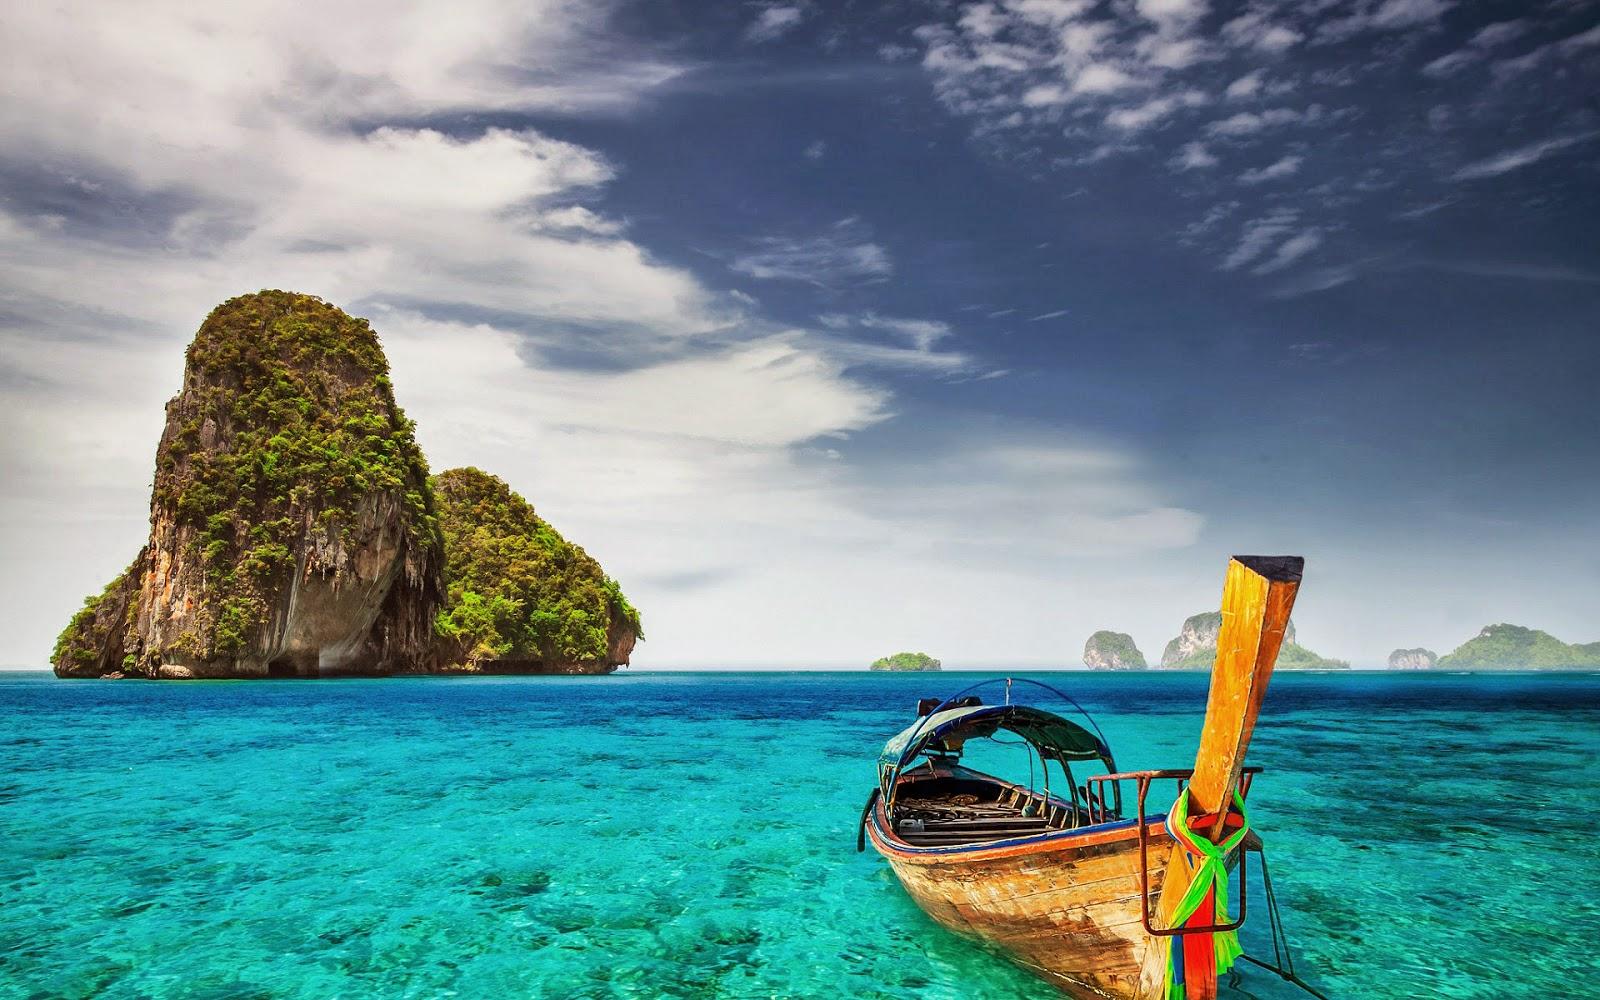 Zzee, bootje en eilanden en mooi helder water